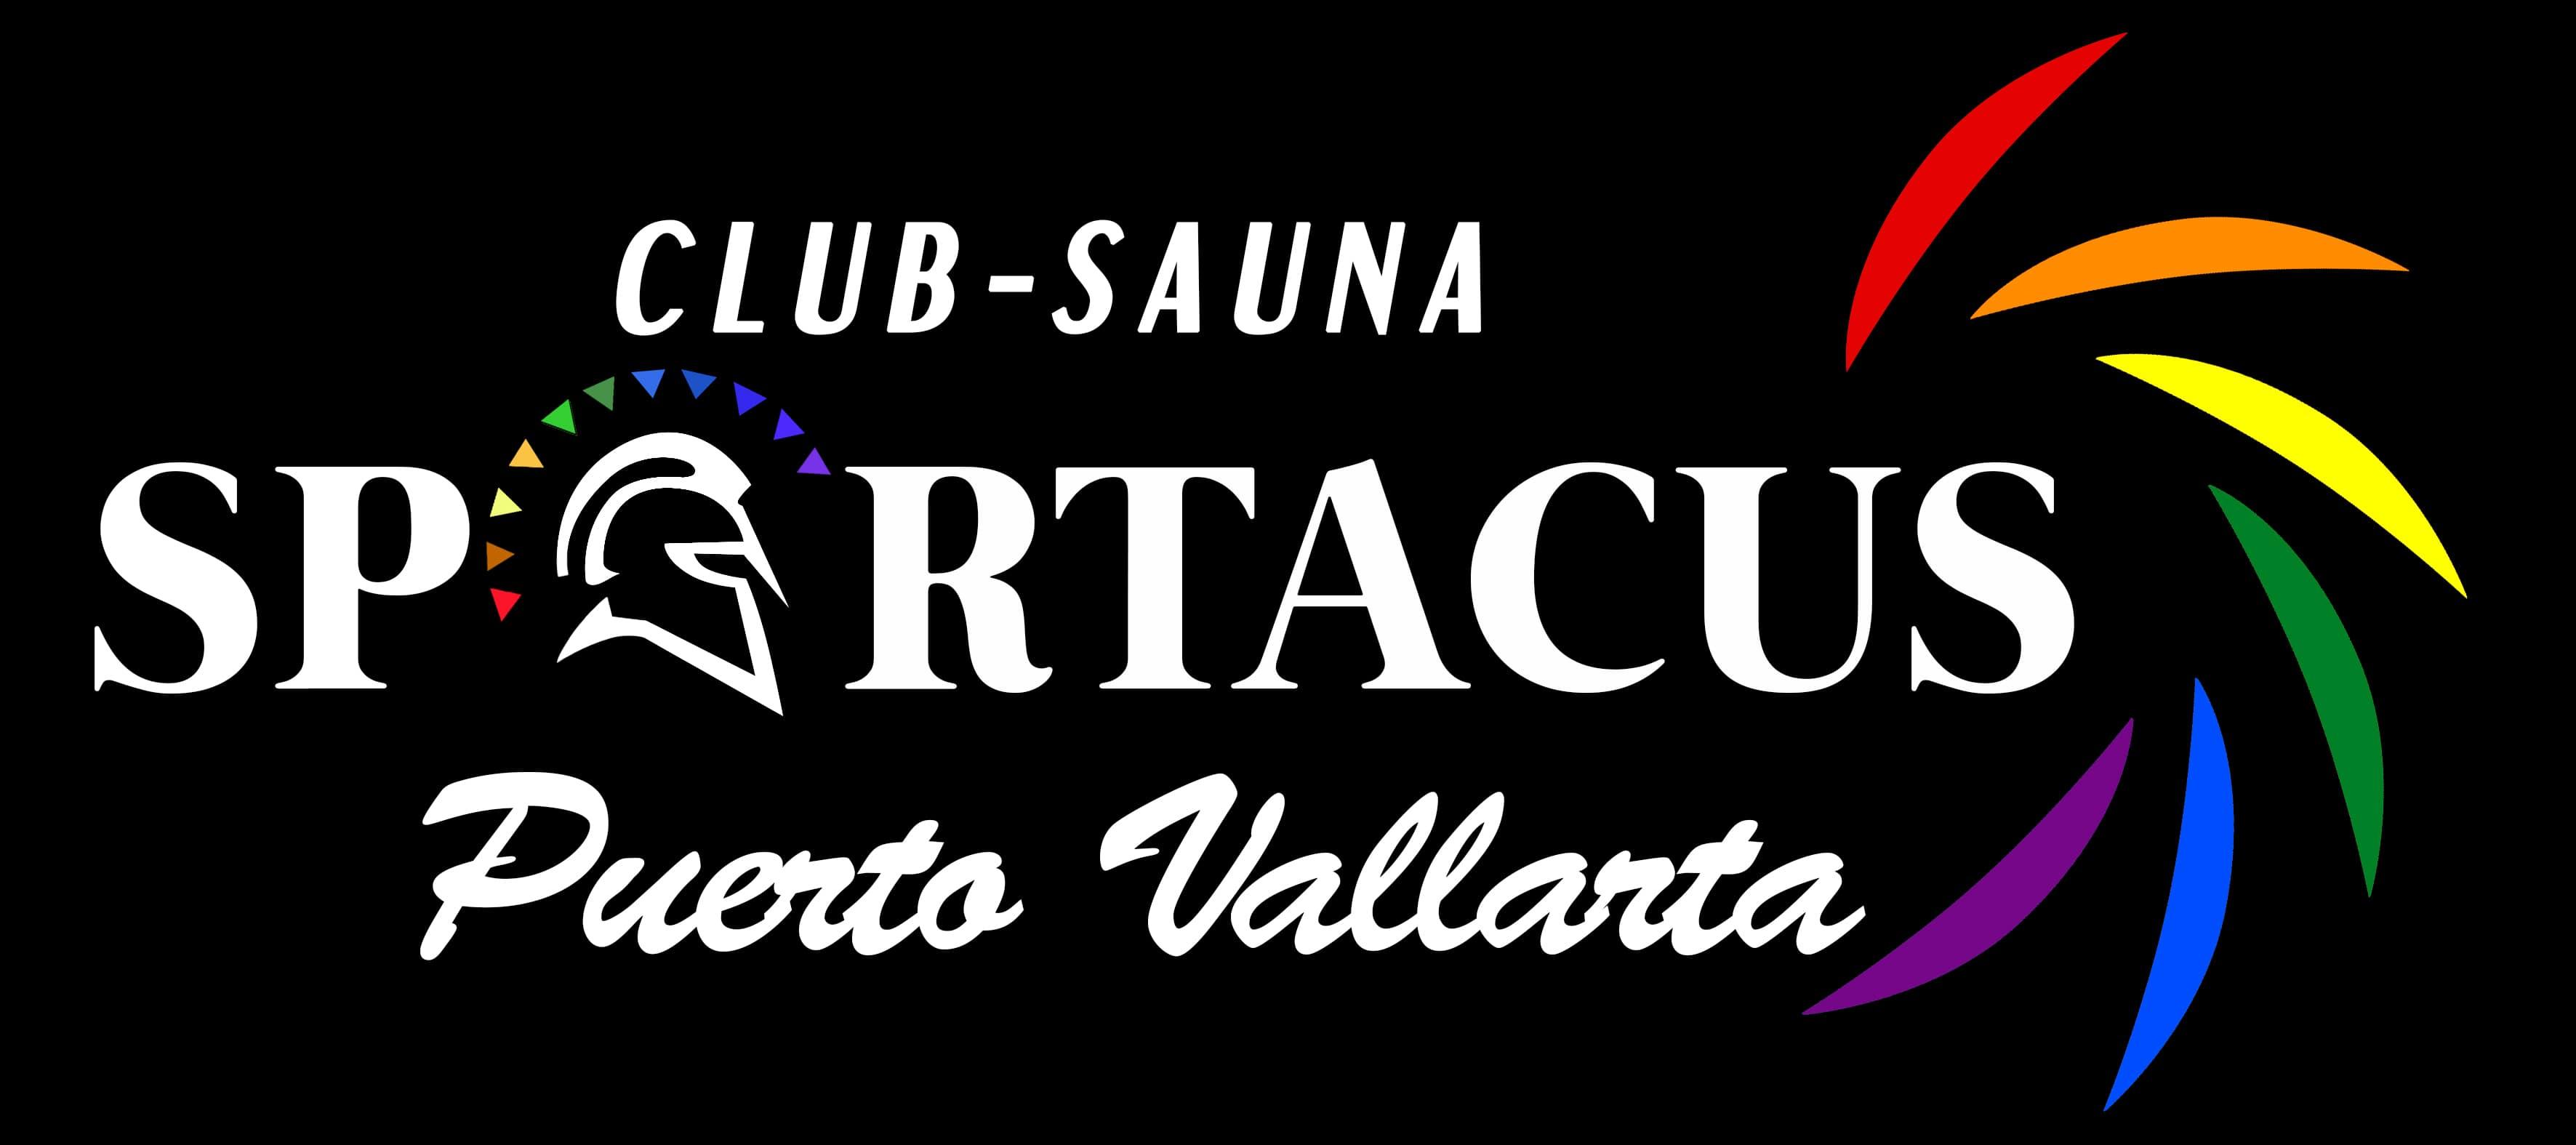 Club Sauna Spartacus Puerto Vallarta Logo